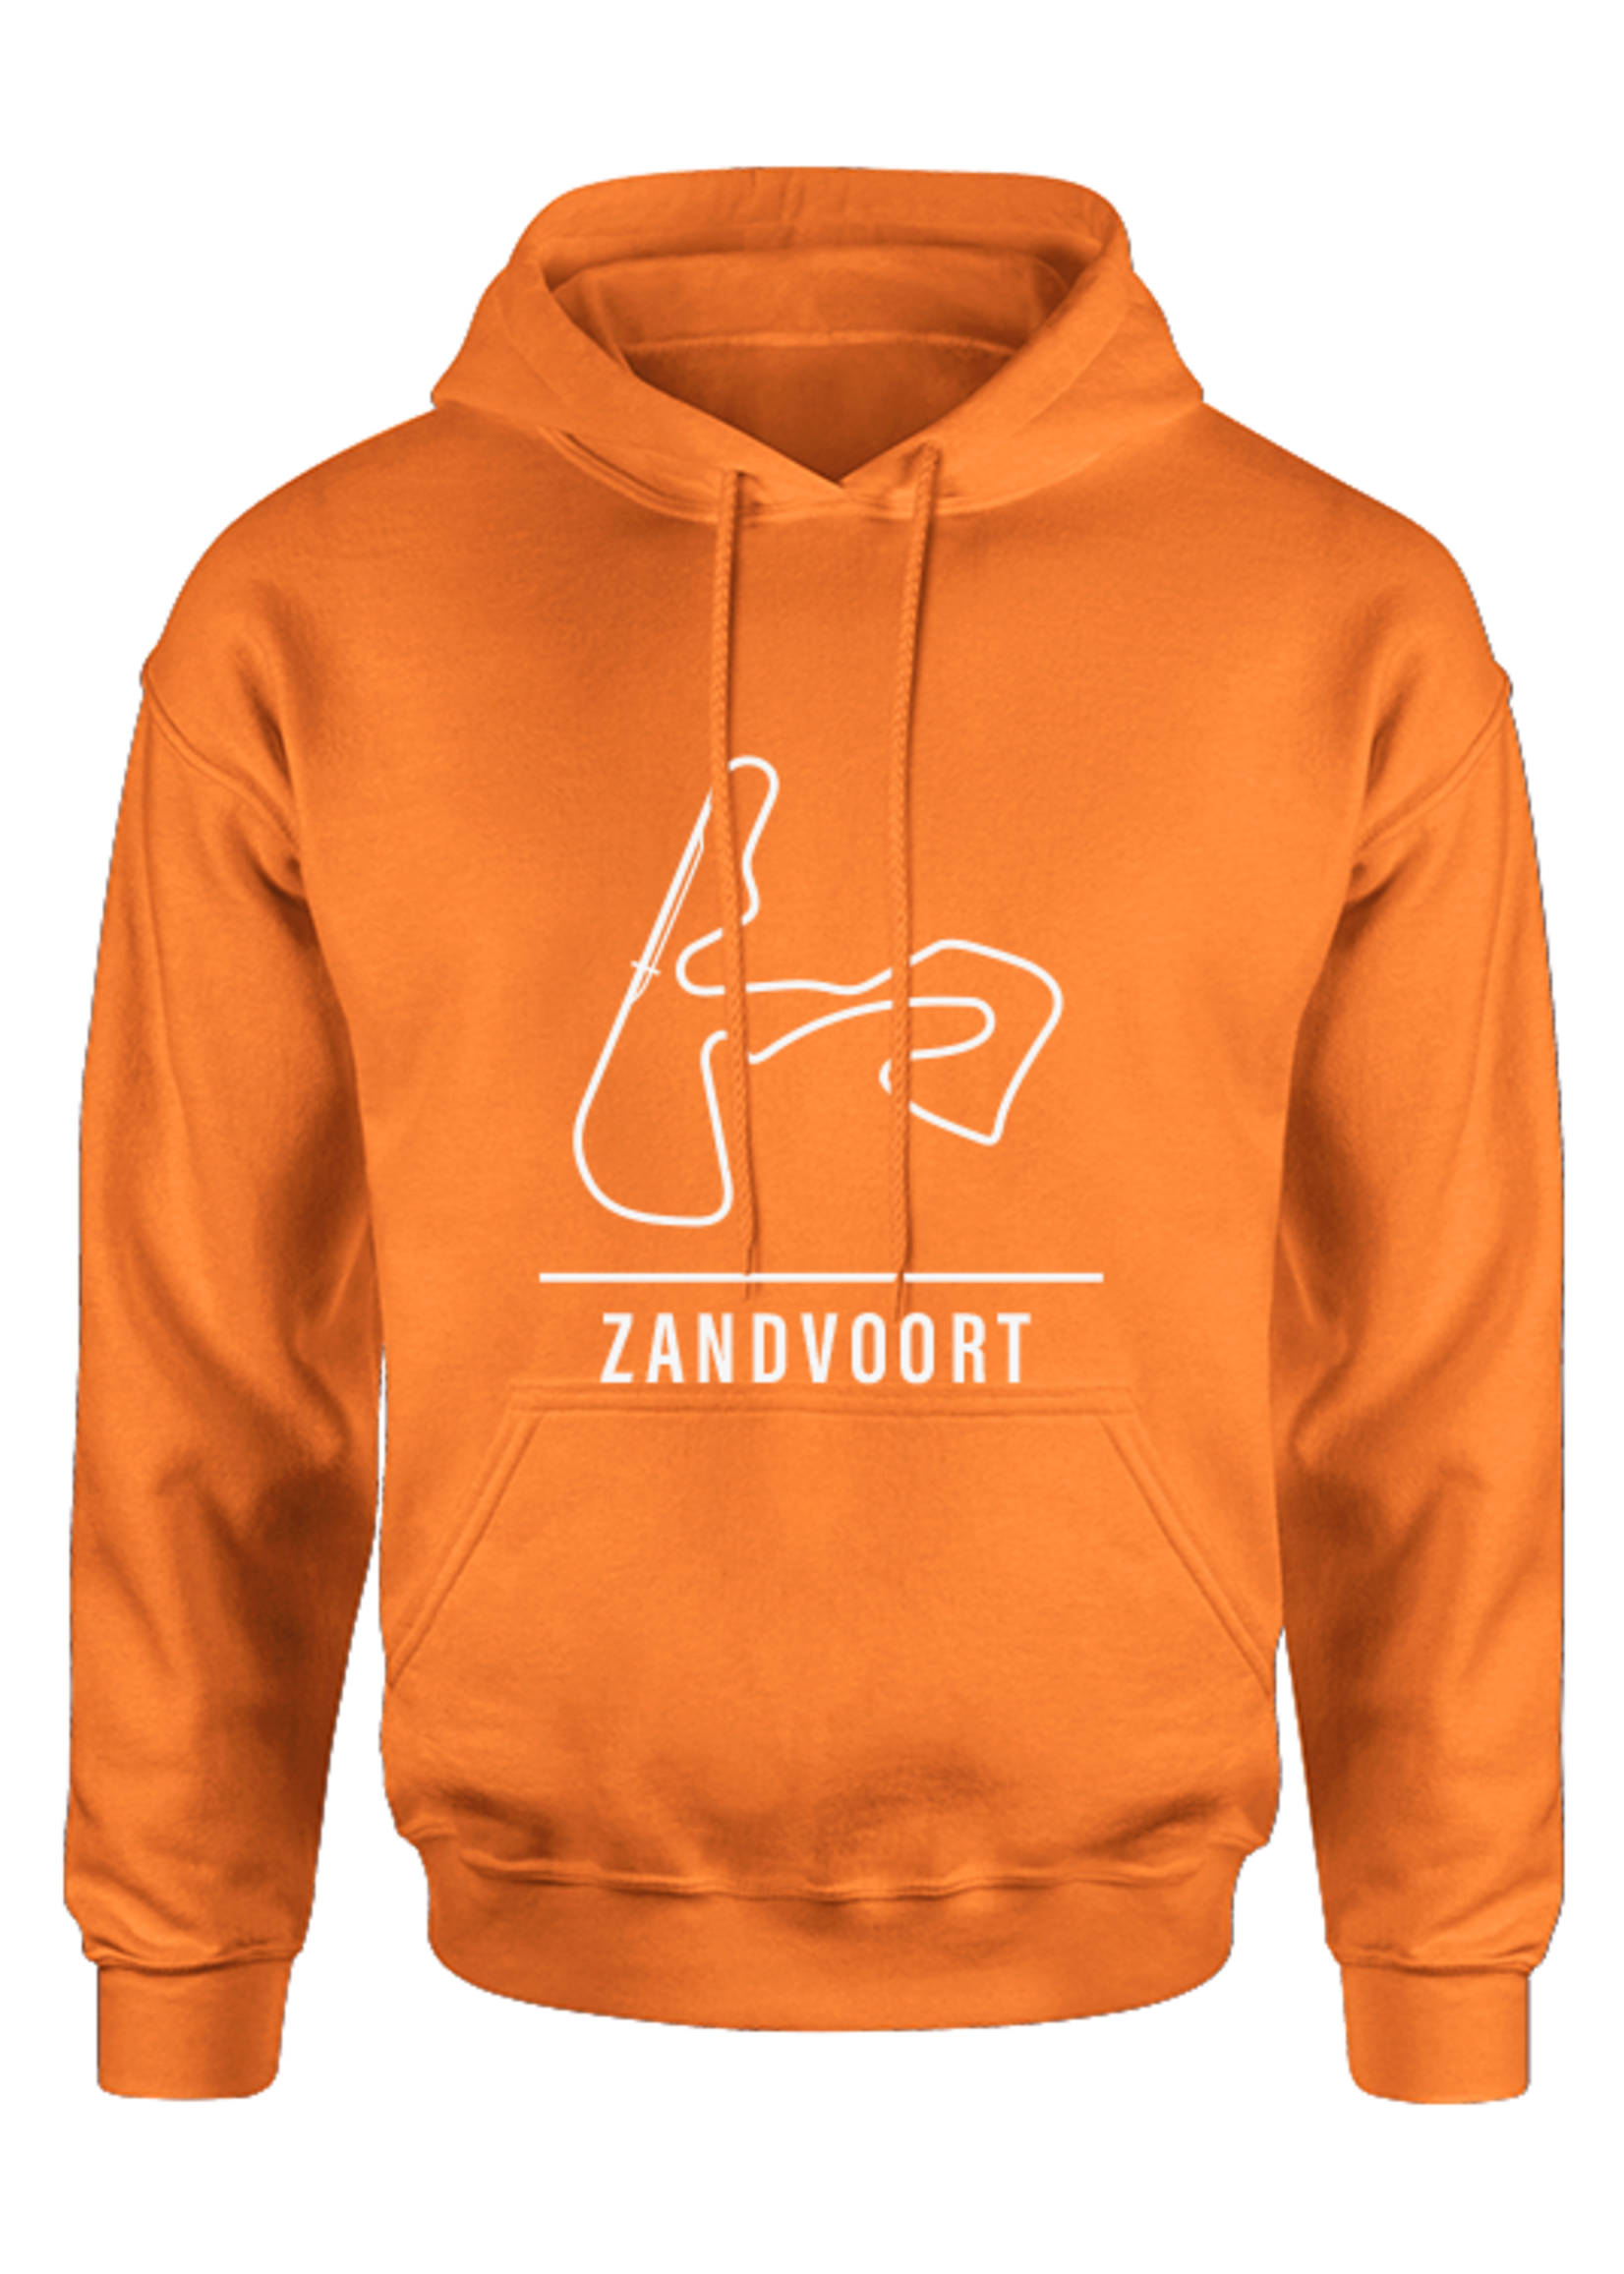 Rebel & Dutch Hoodie Zandvoort